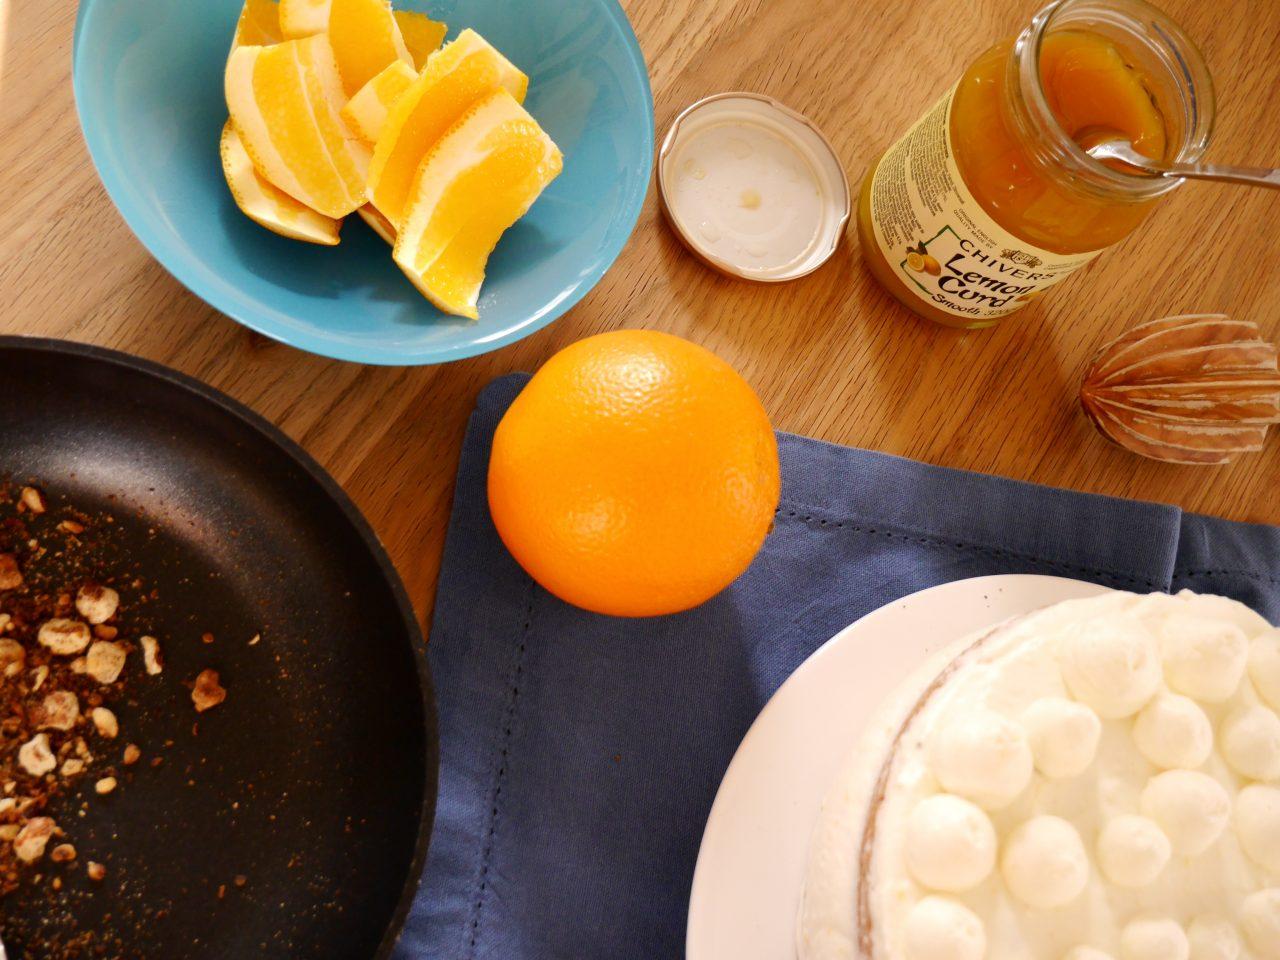 köln beste, orangenkuchen, leckerche, rezept